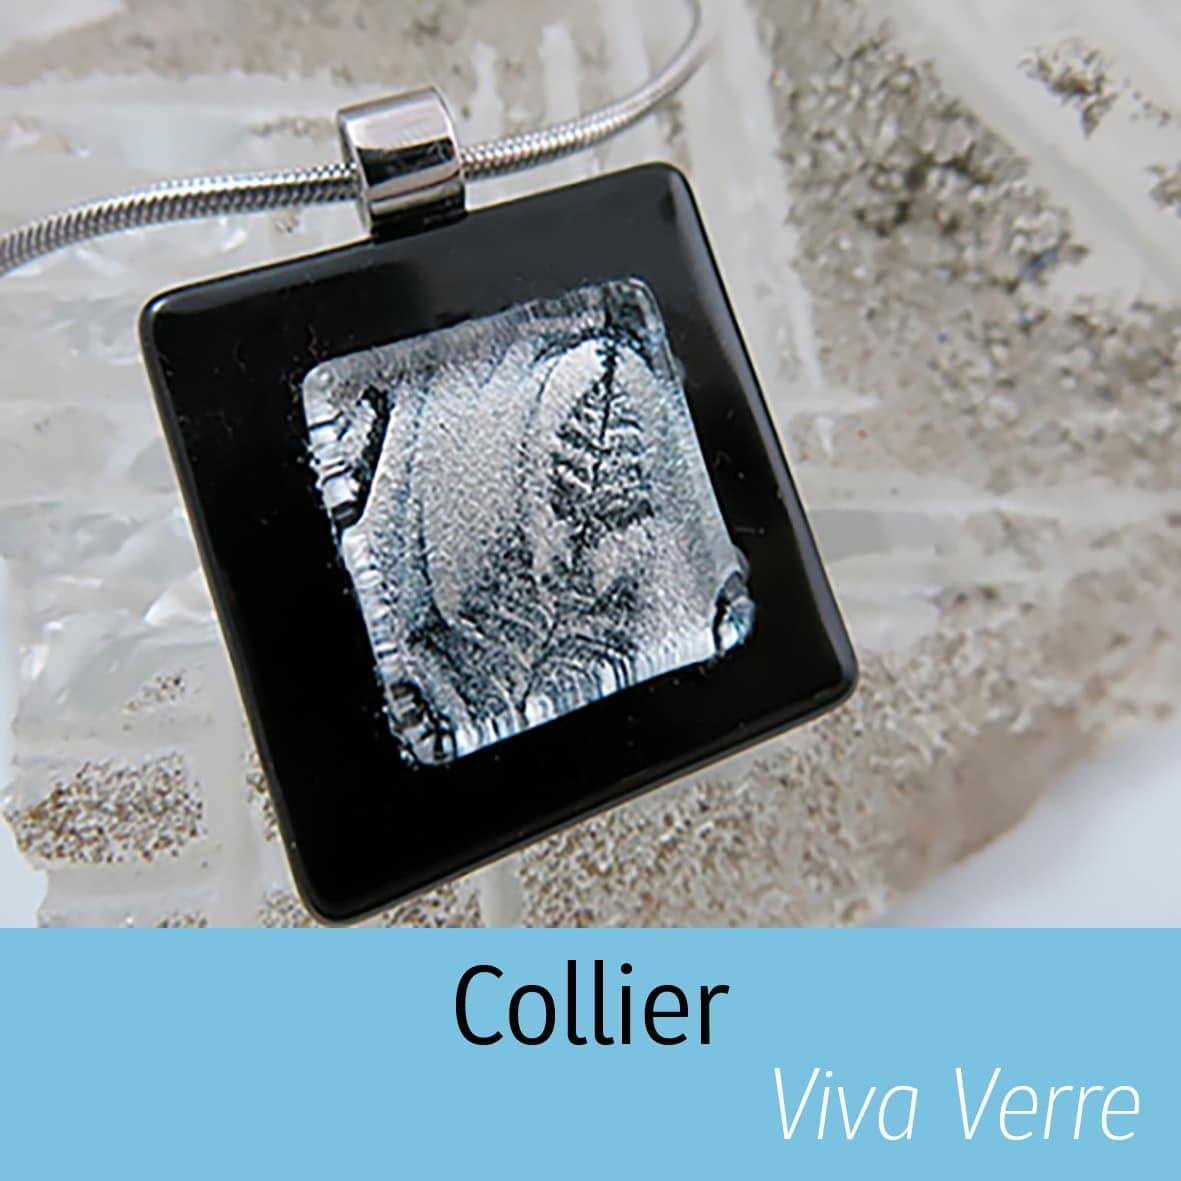 Collier Viva Verre